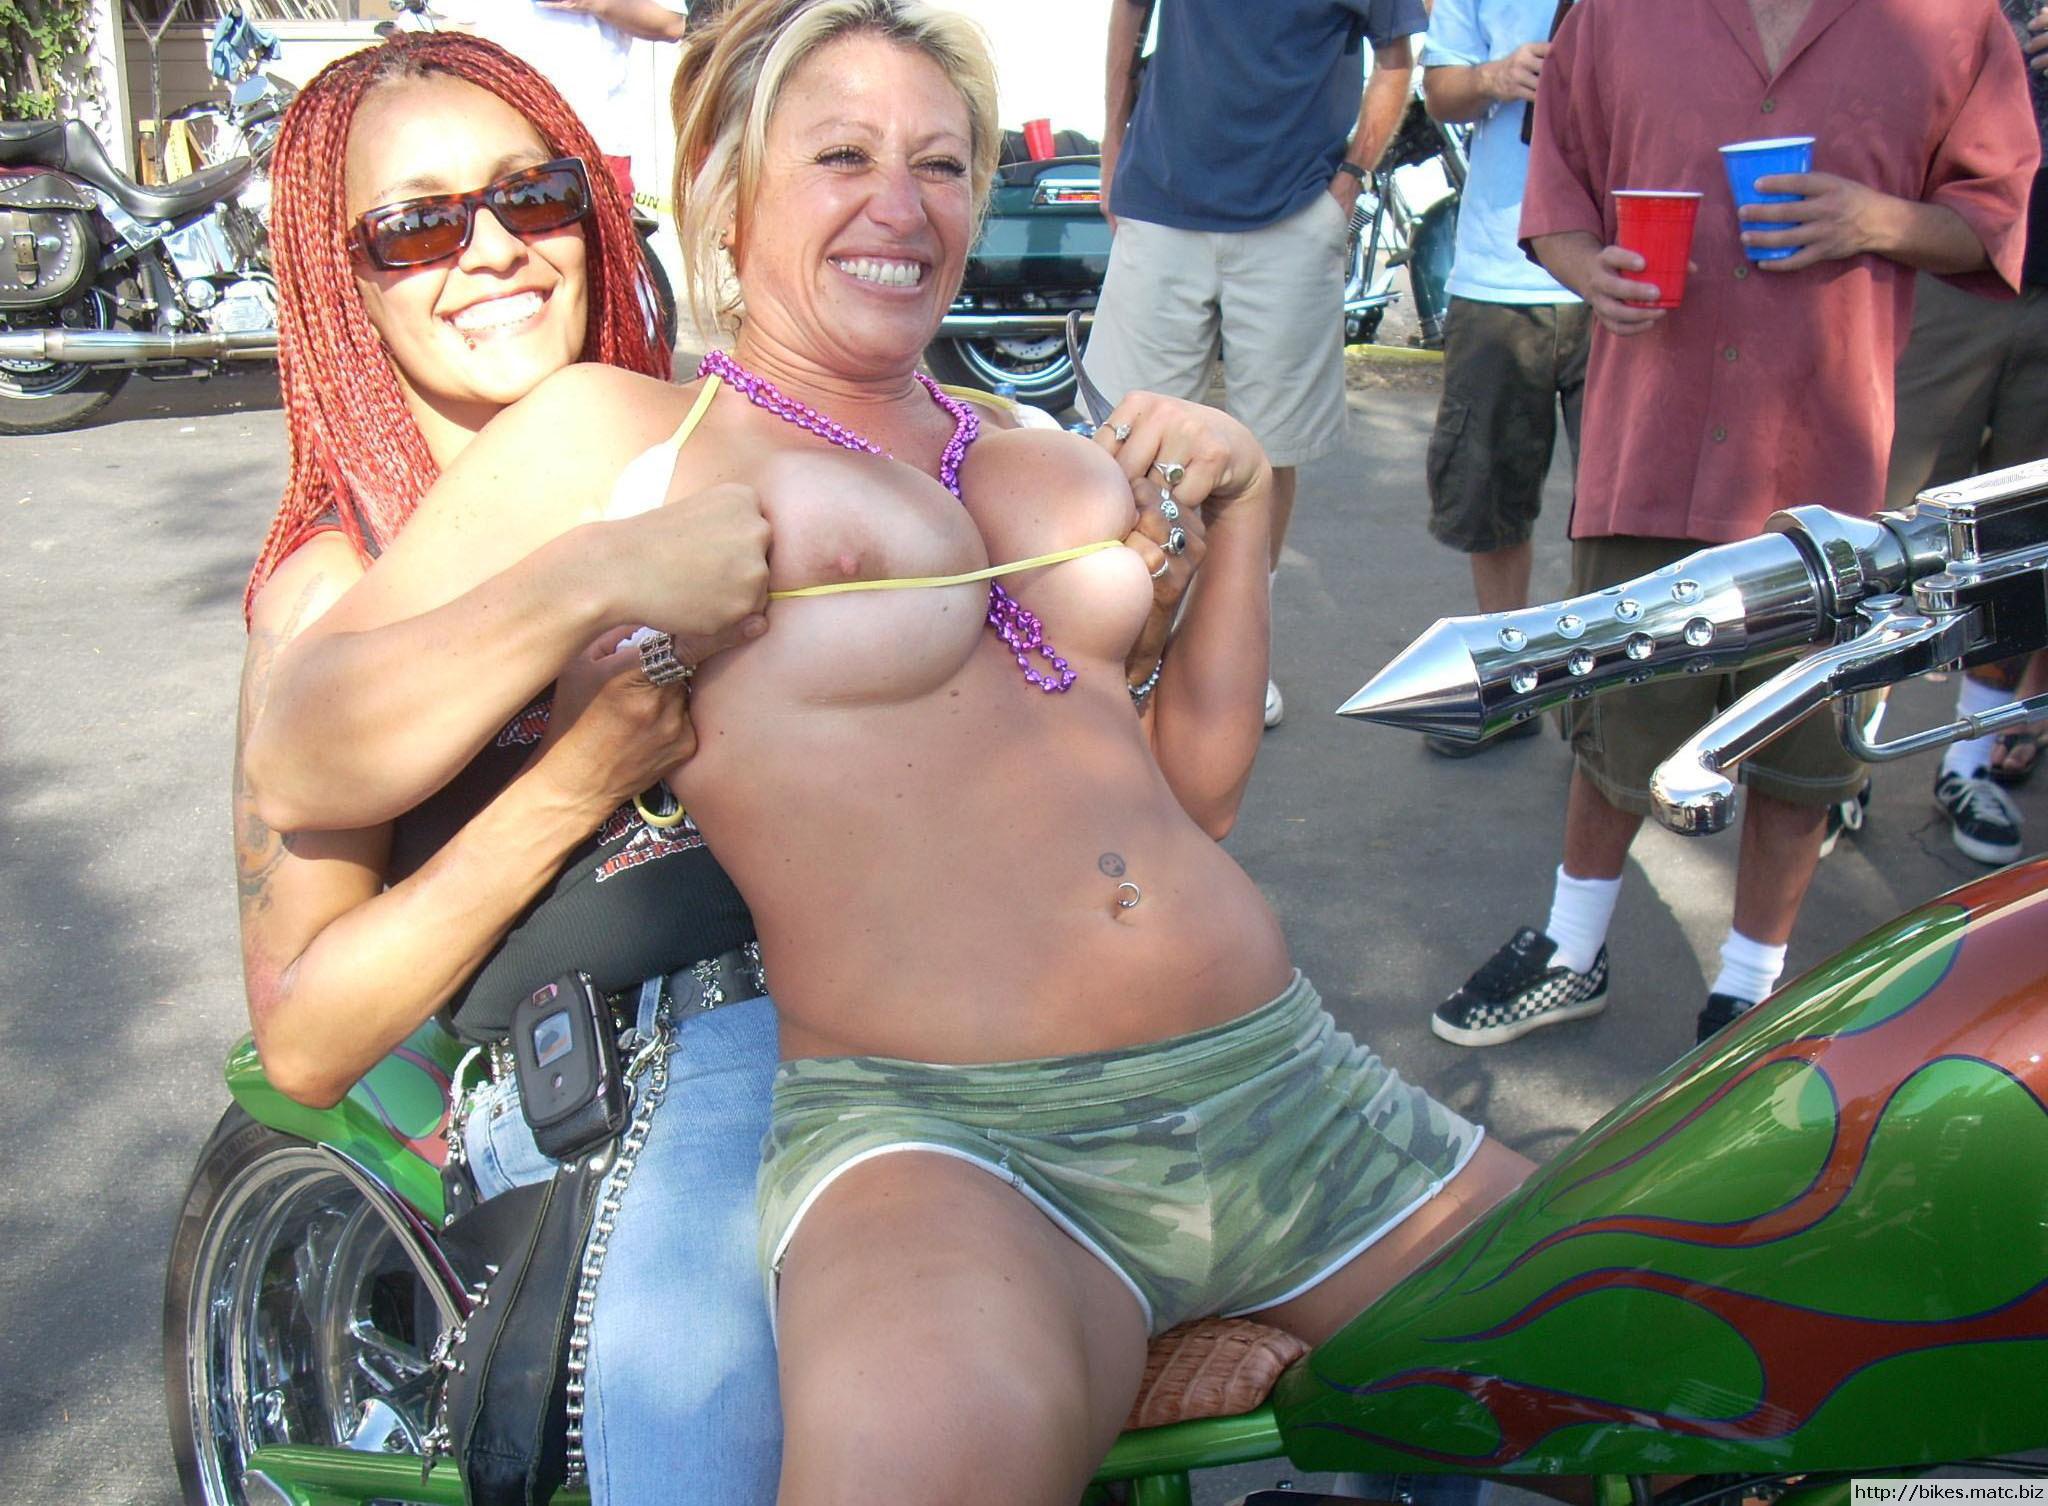 tranny-upside-amateur-chubby-biker-rally-bitches-porn